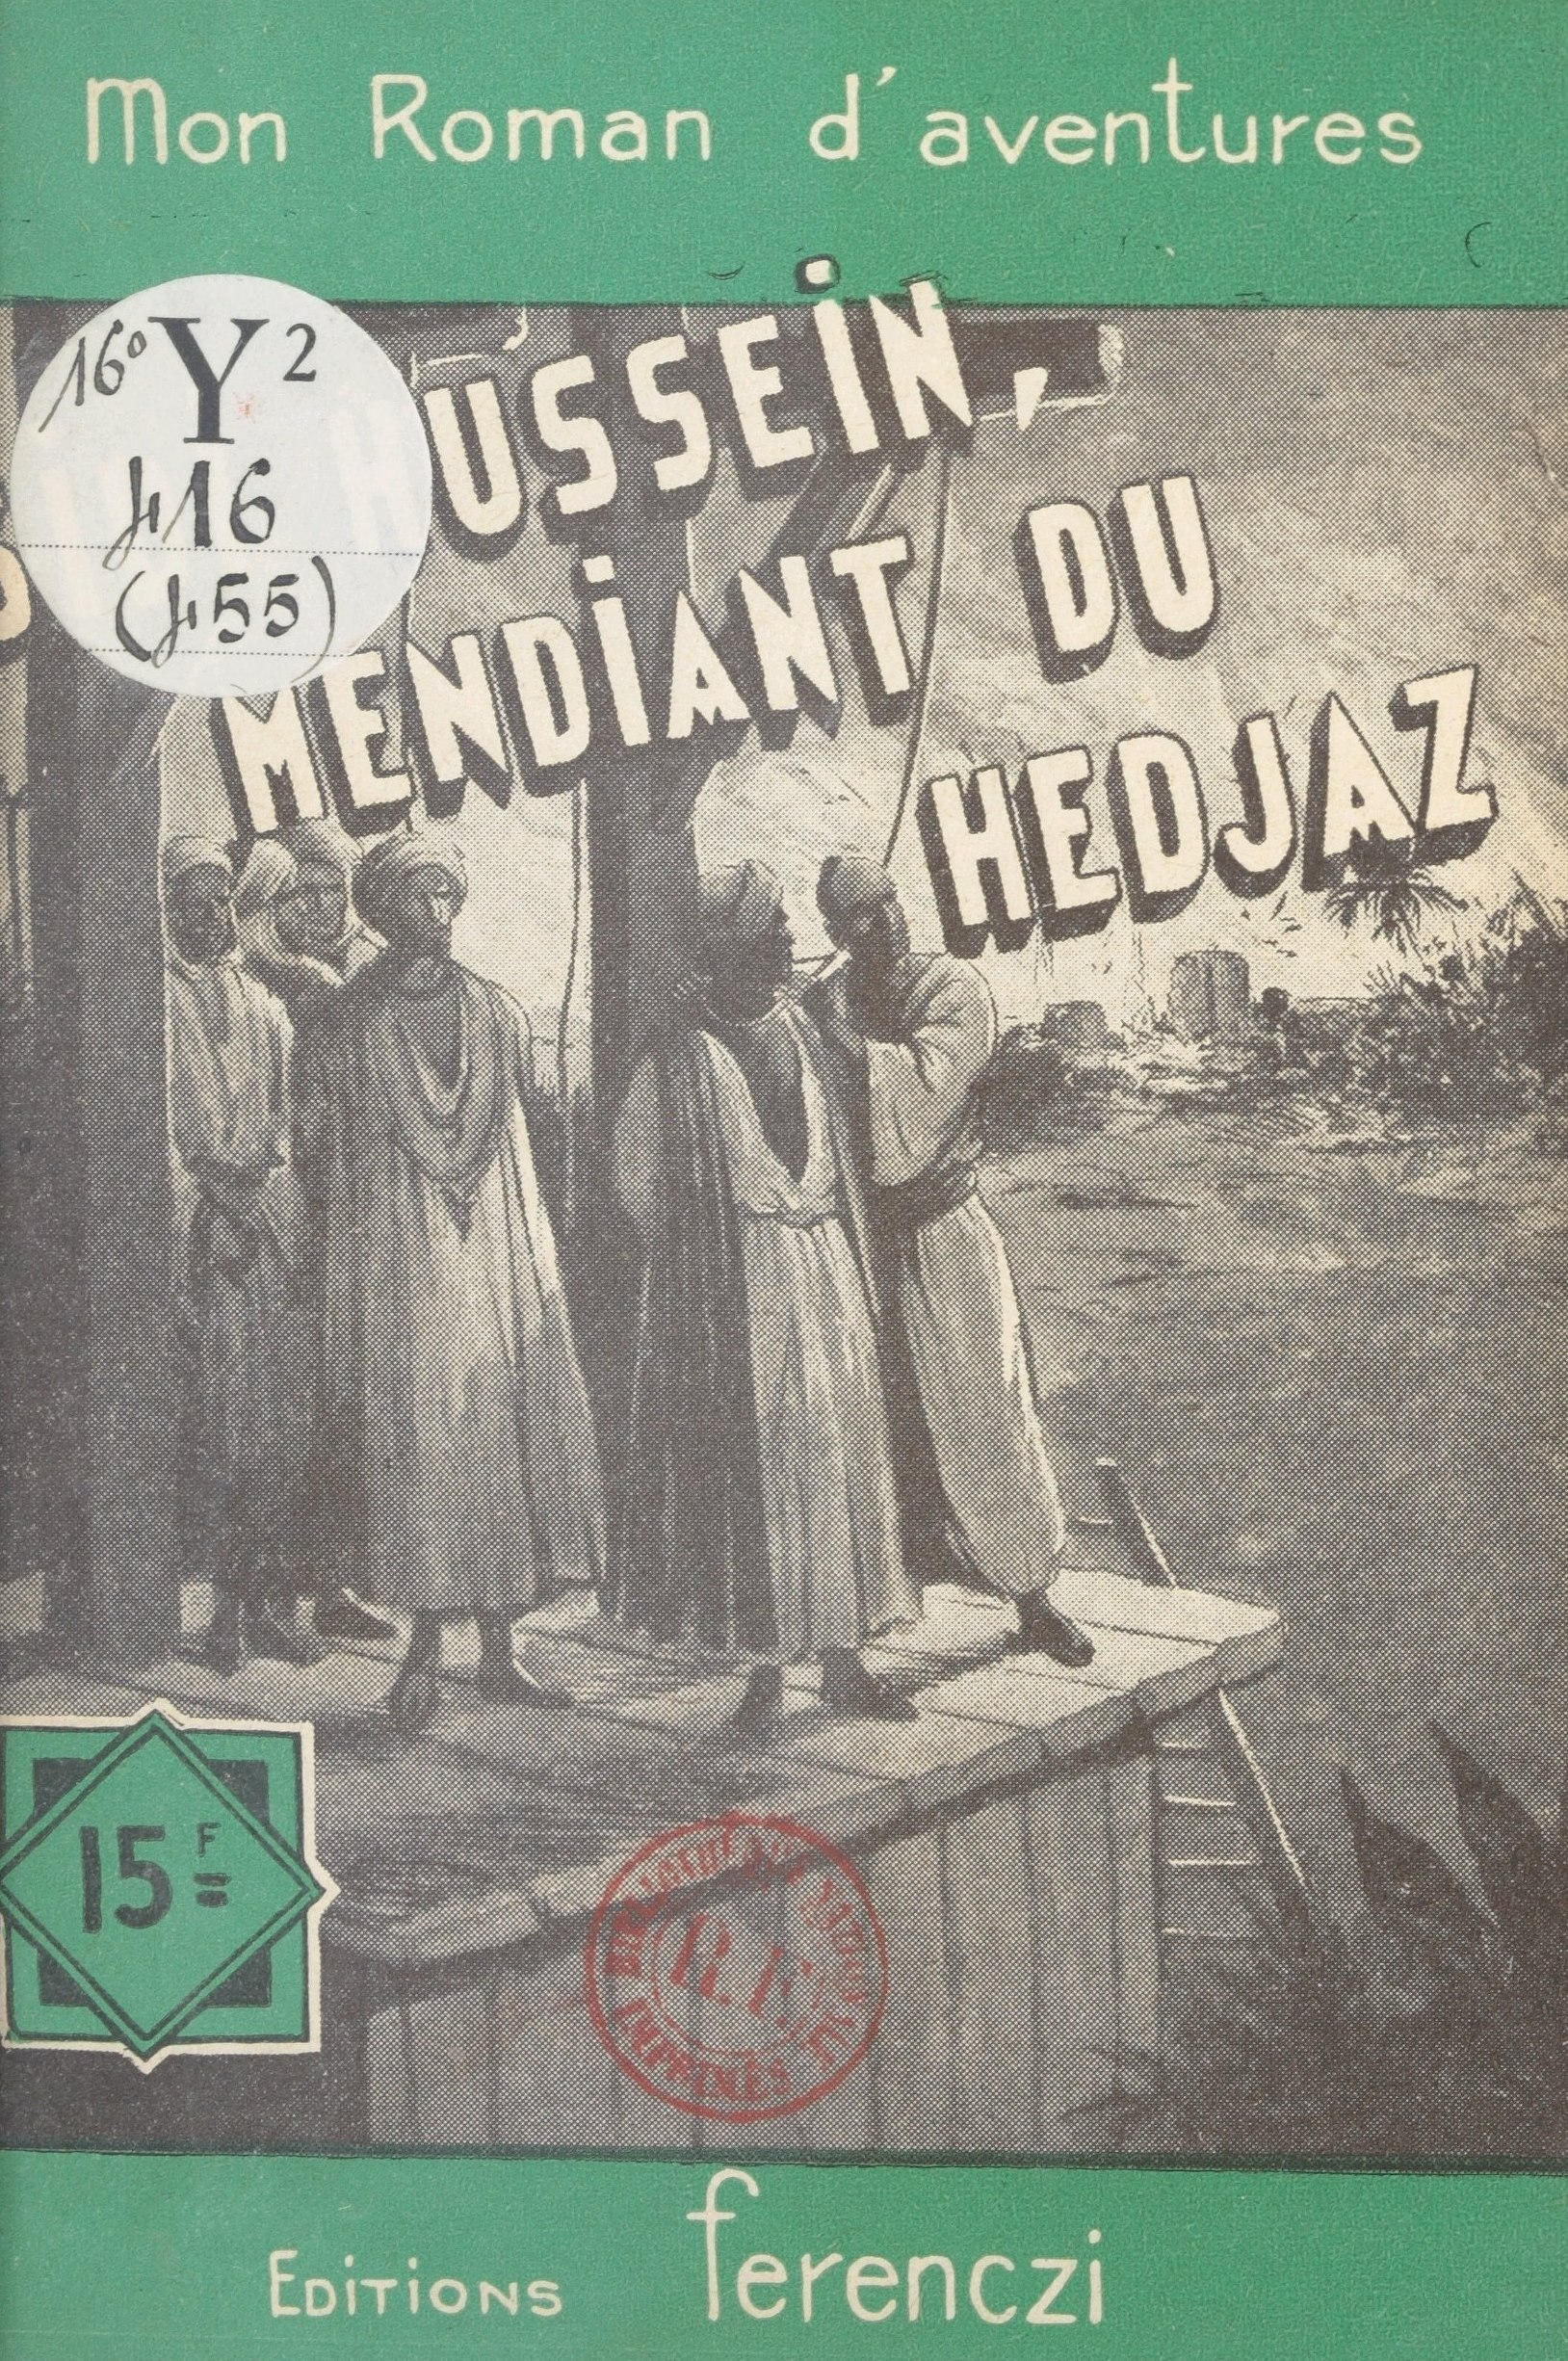 Sidi Husseïn, mendiant du Hedjaz